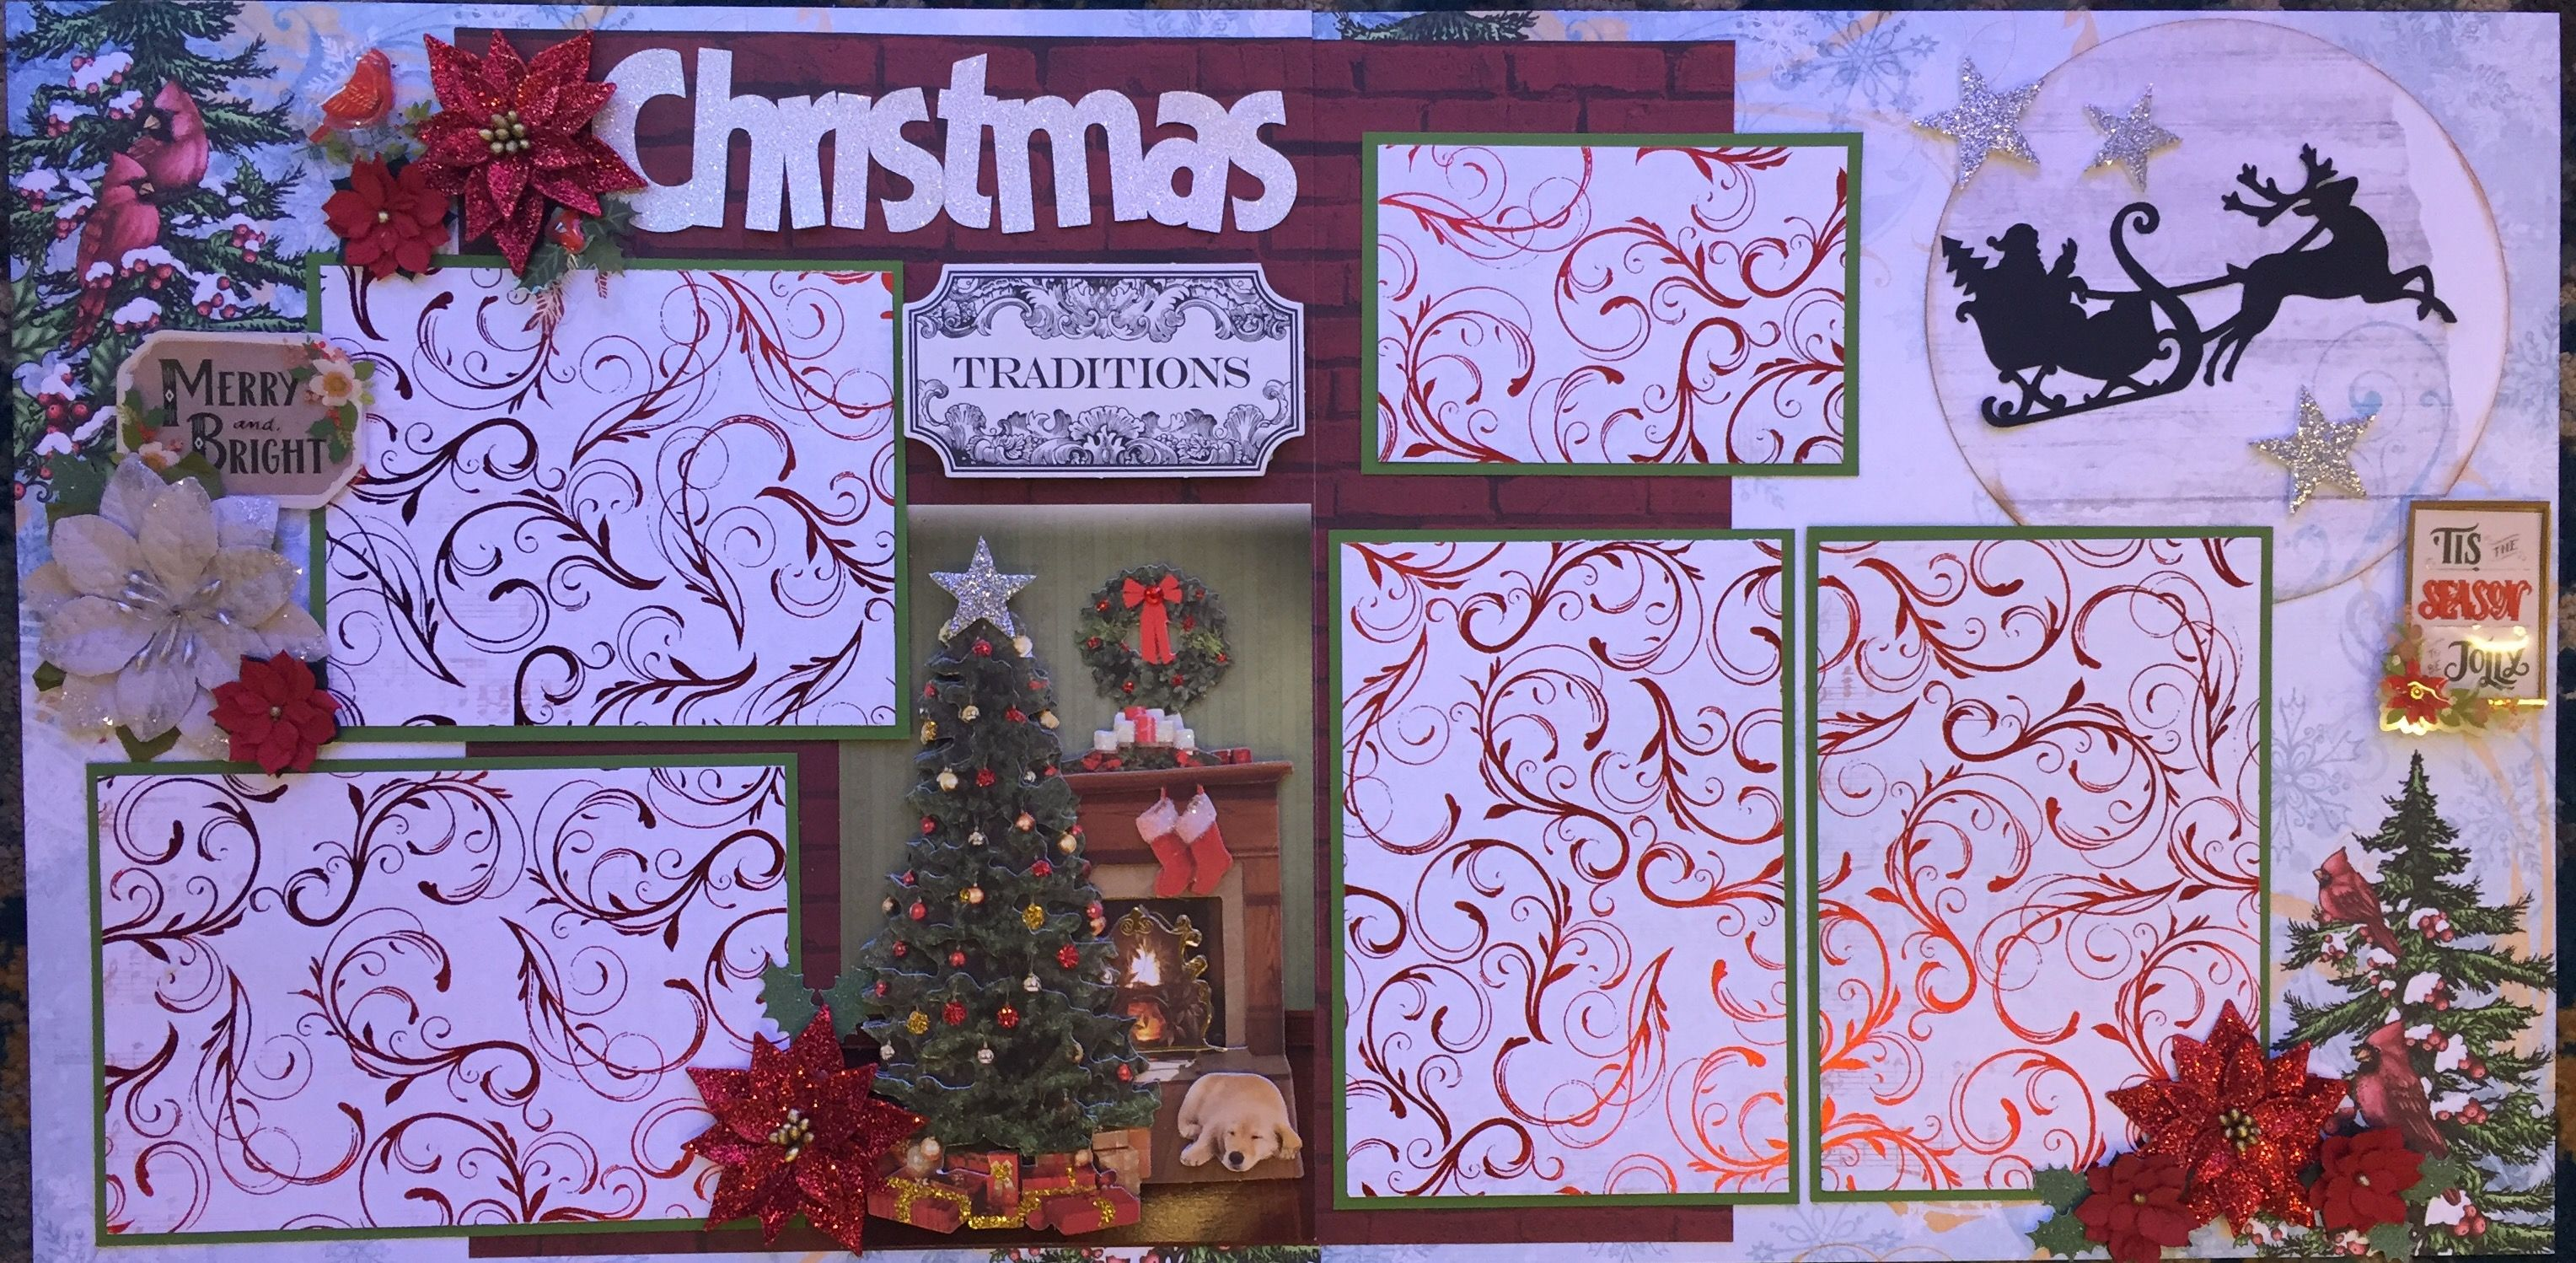 Pin by Sherry Lovelass on Christmas layouts Pinterest